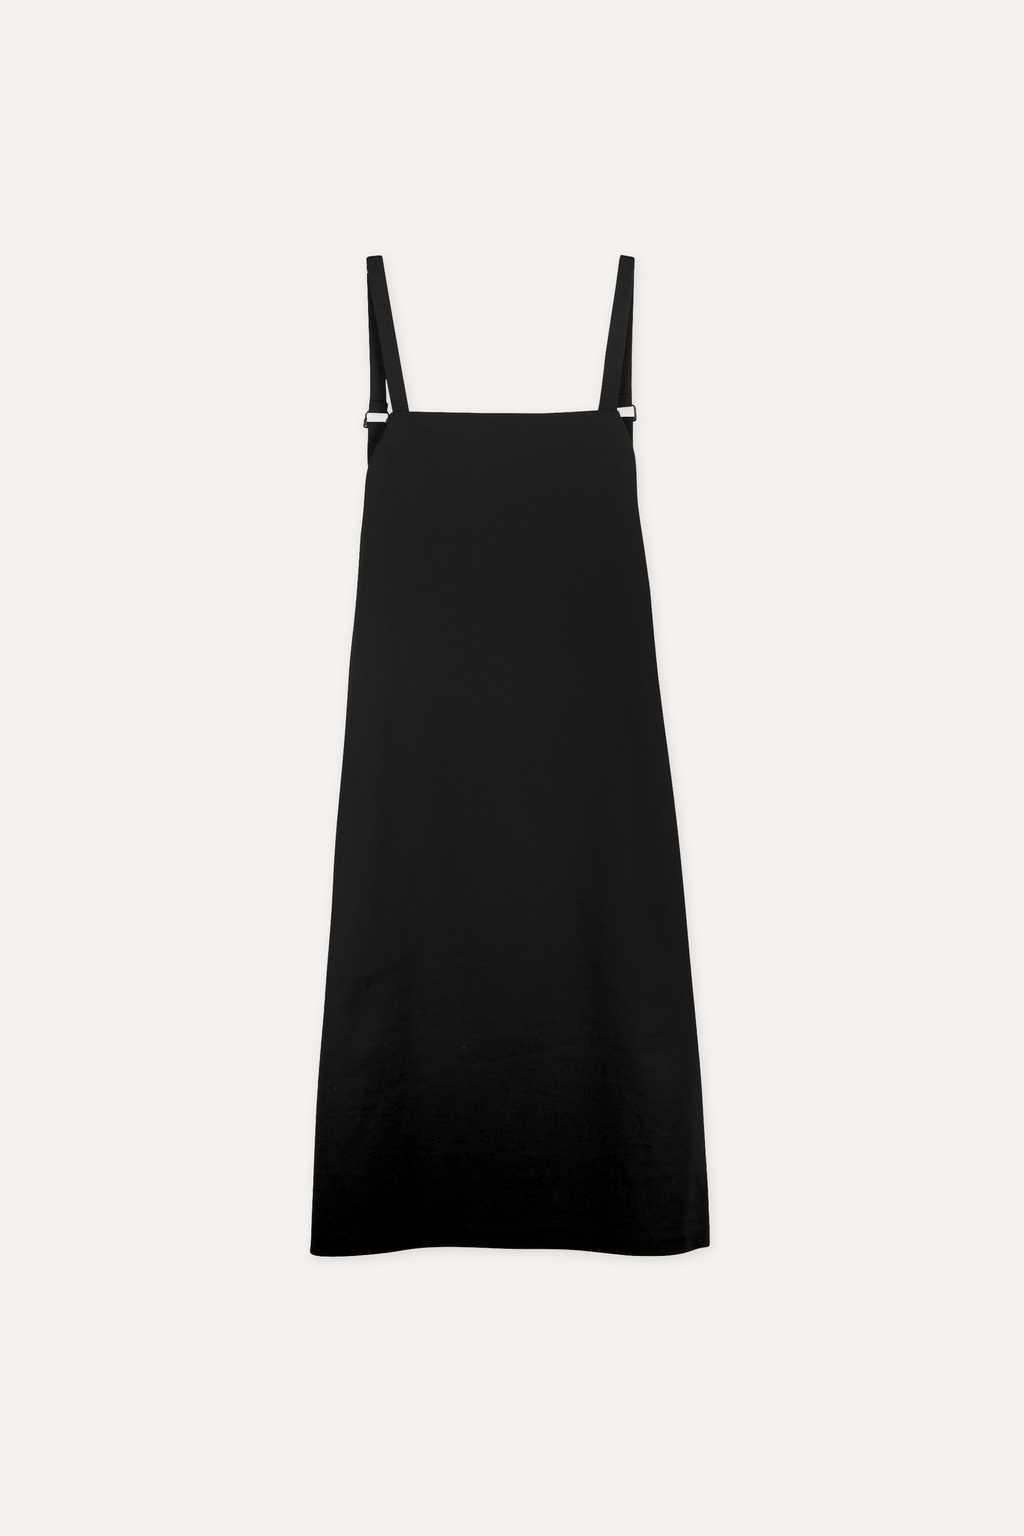 Dress 1577 Black 11